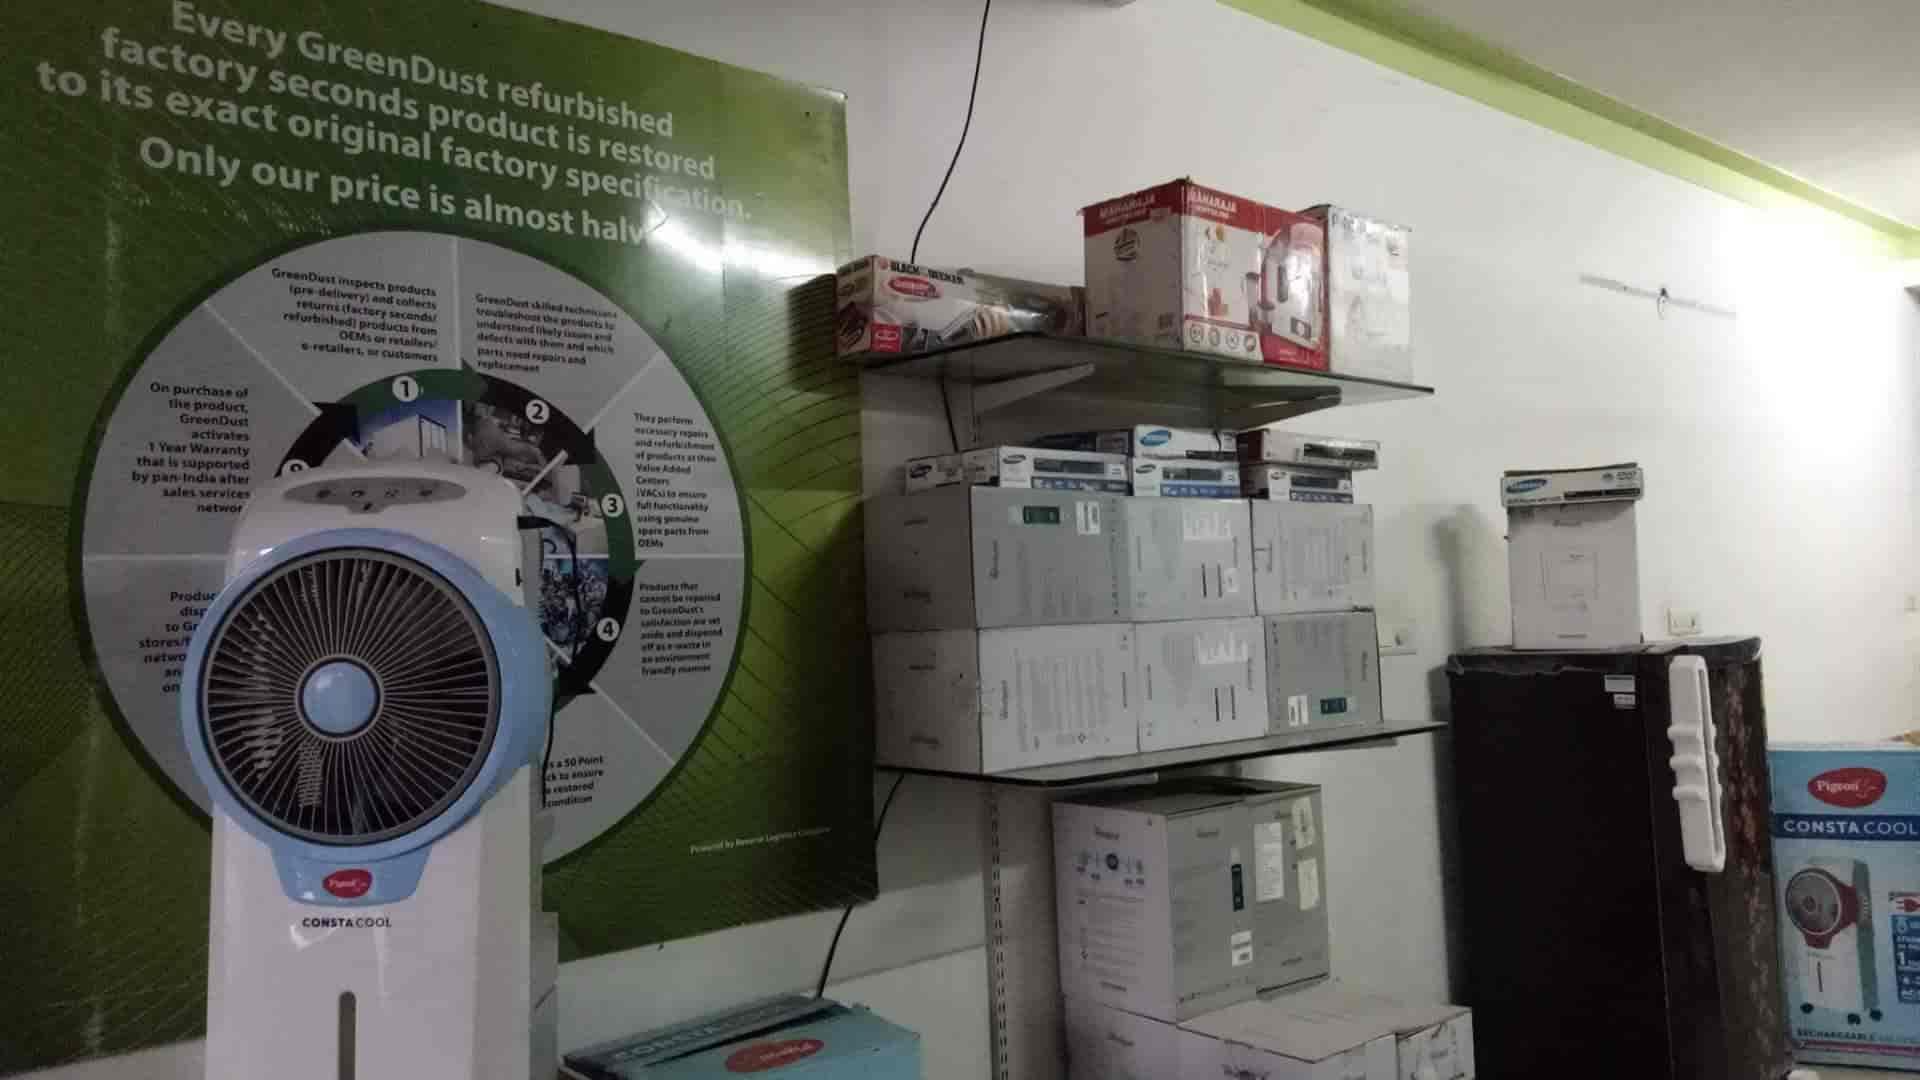 Green Dust, Ktj Nagar - Electronic Goods Showrooms in